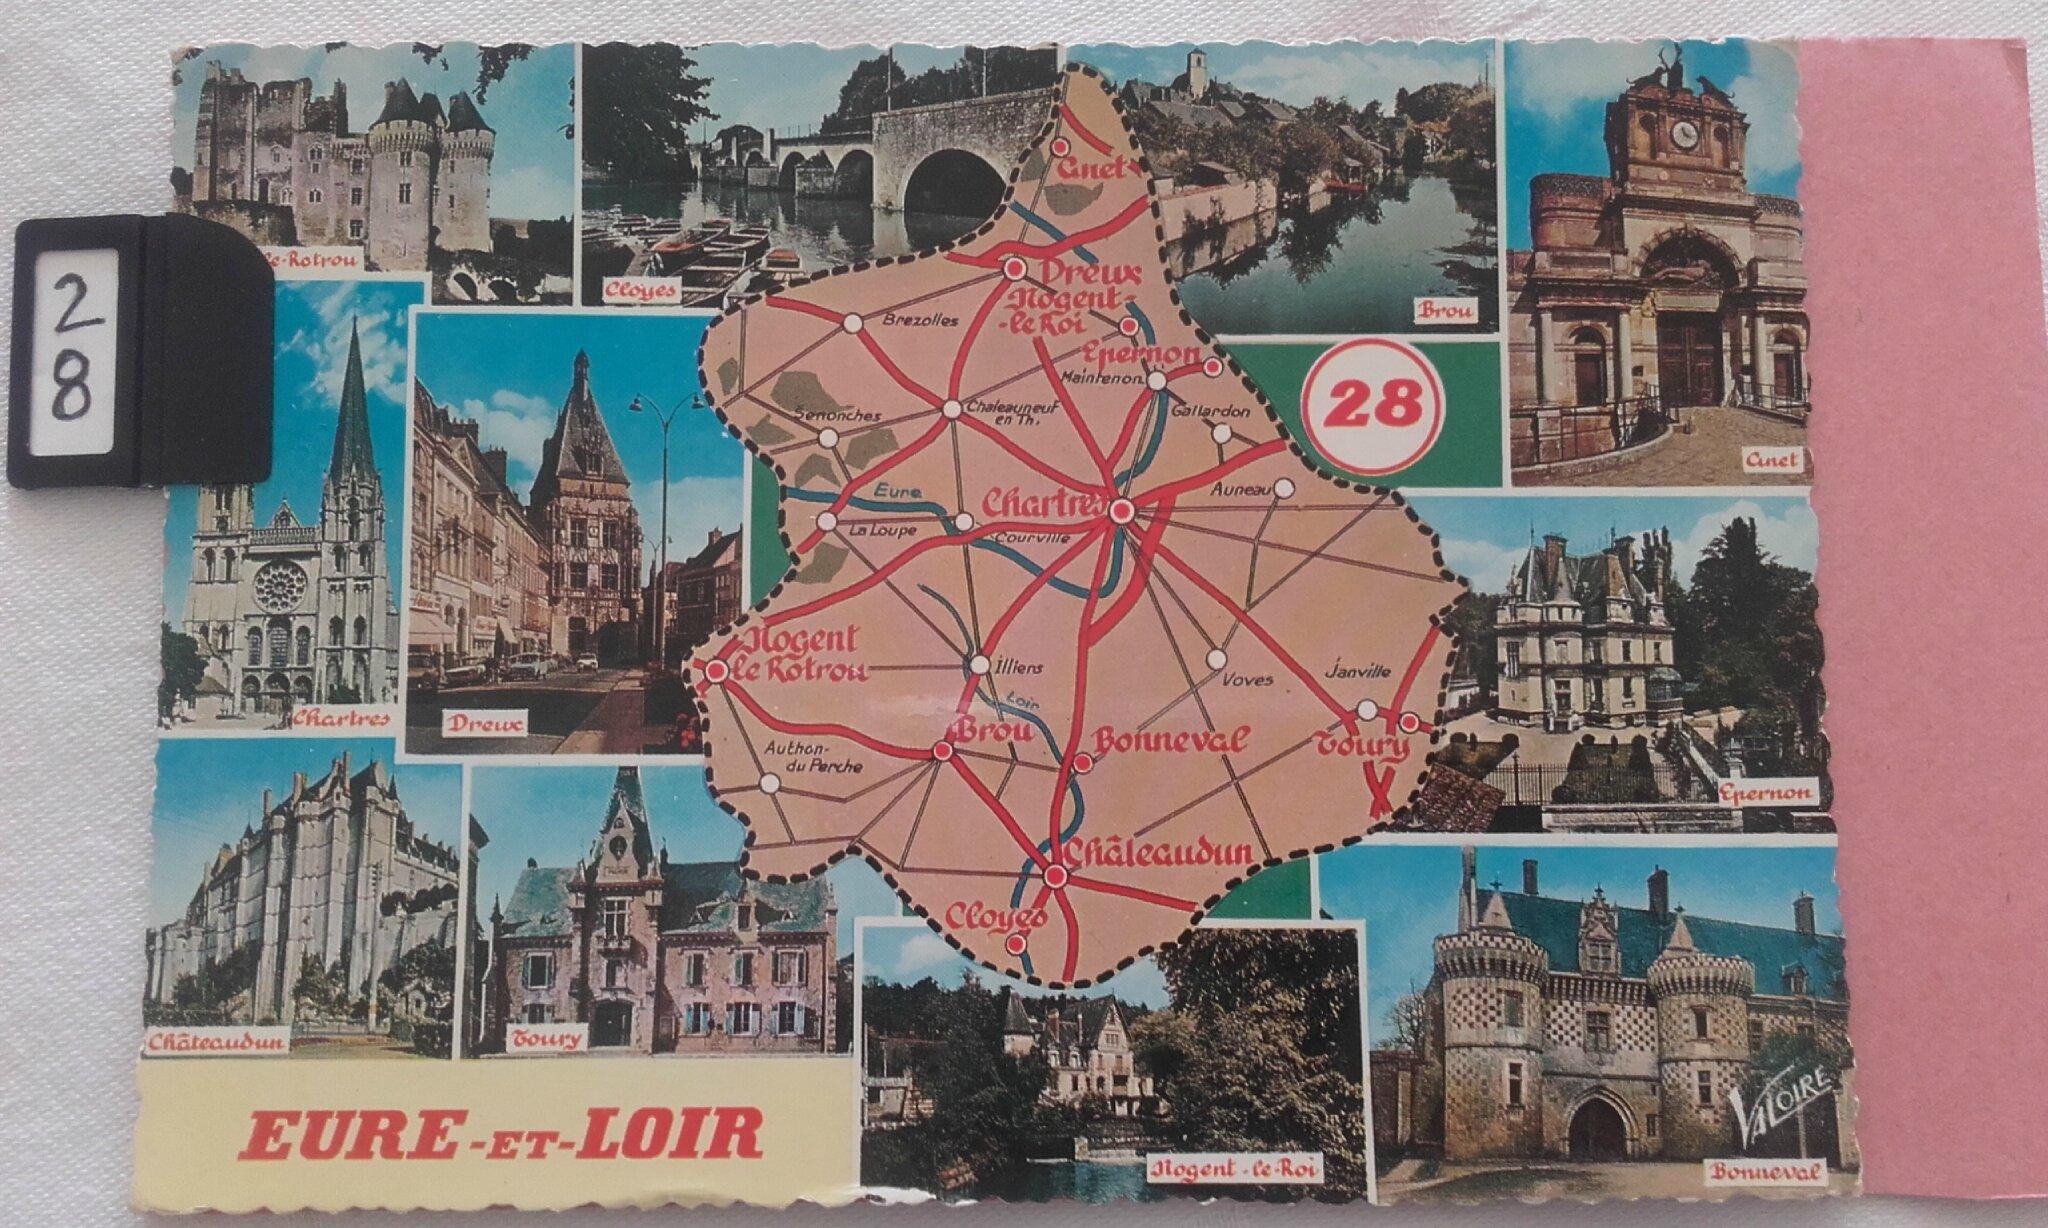 01 Eure et Loir